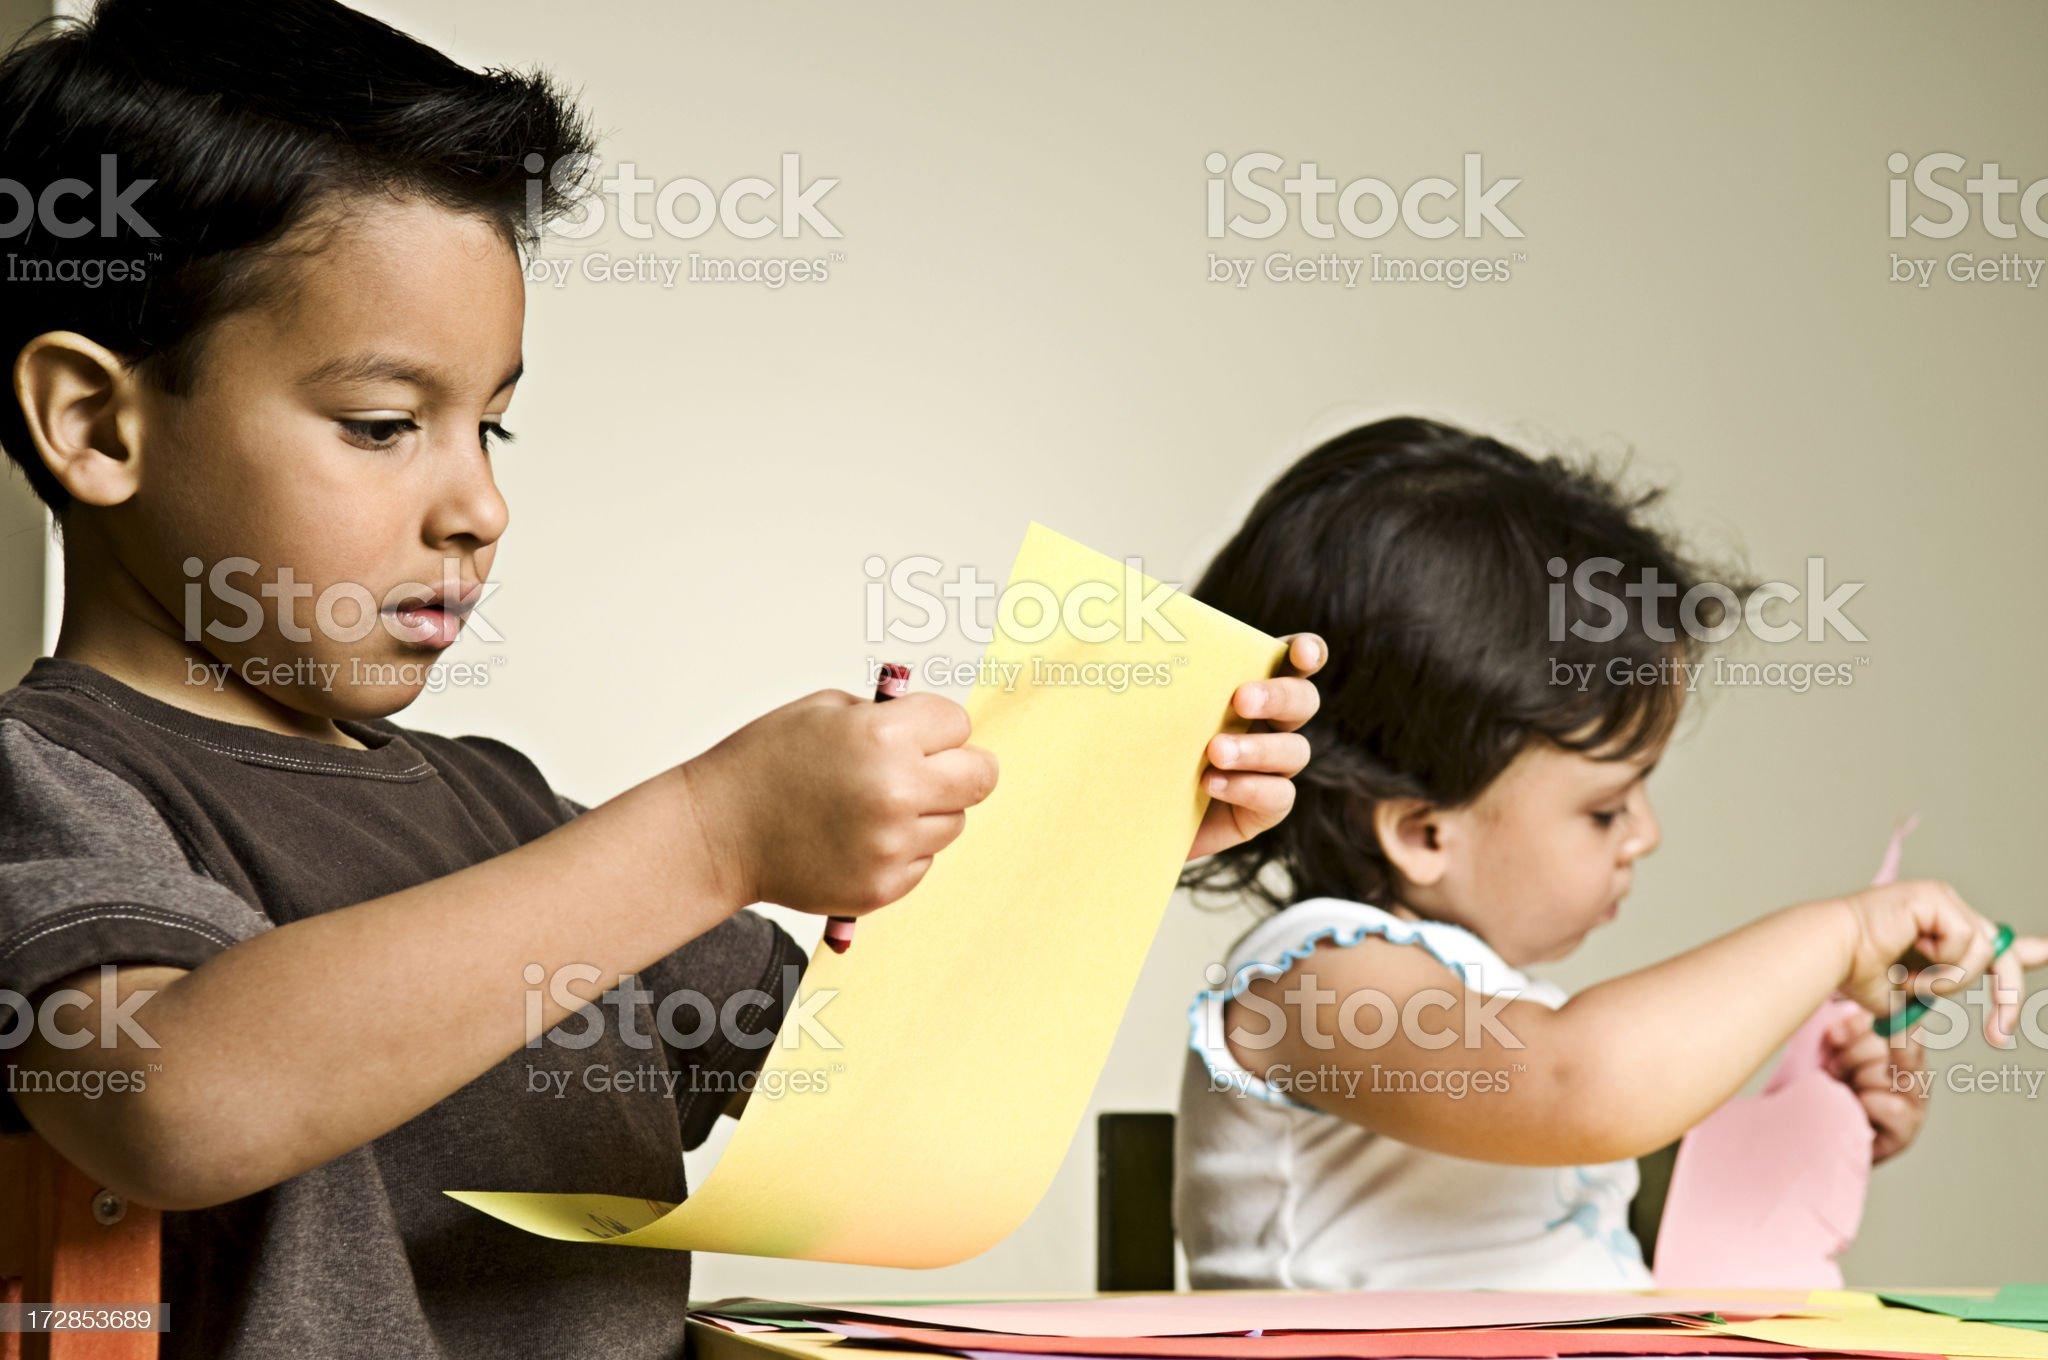 children in art class royalty-free stock photo